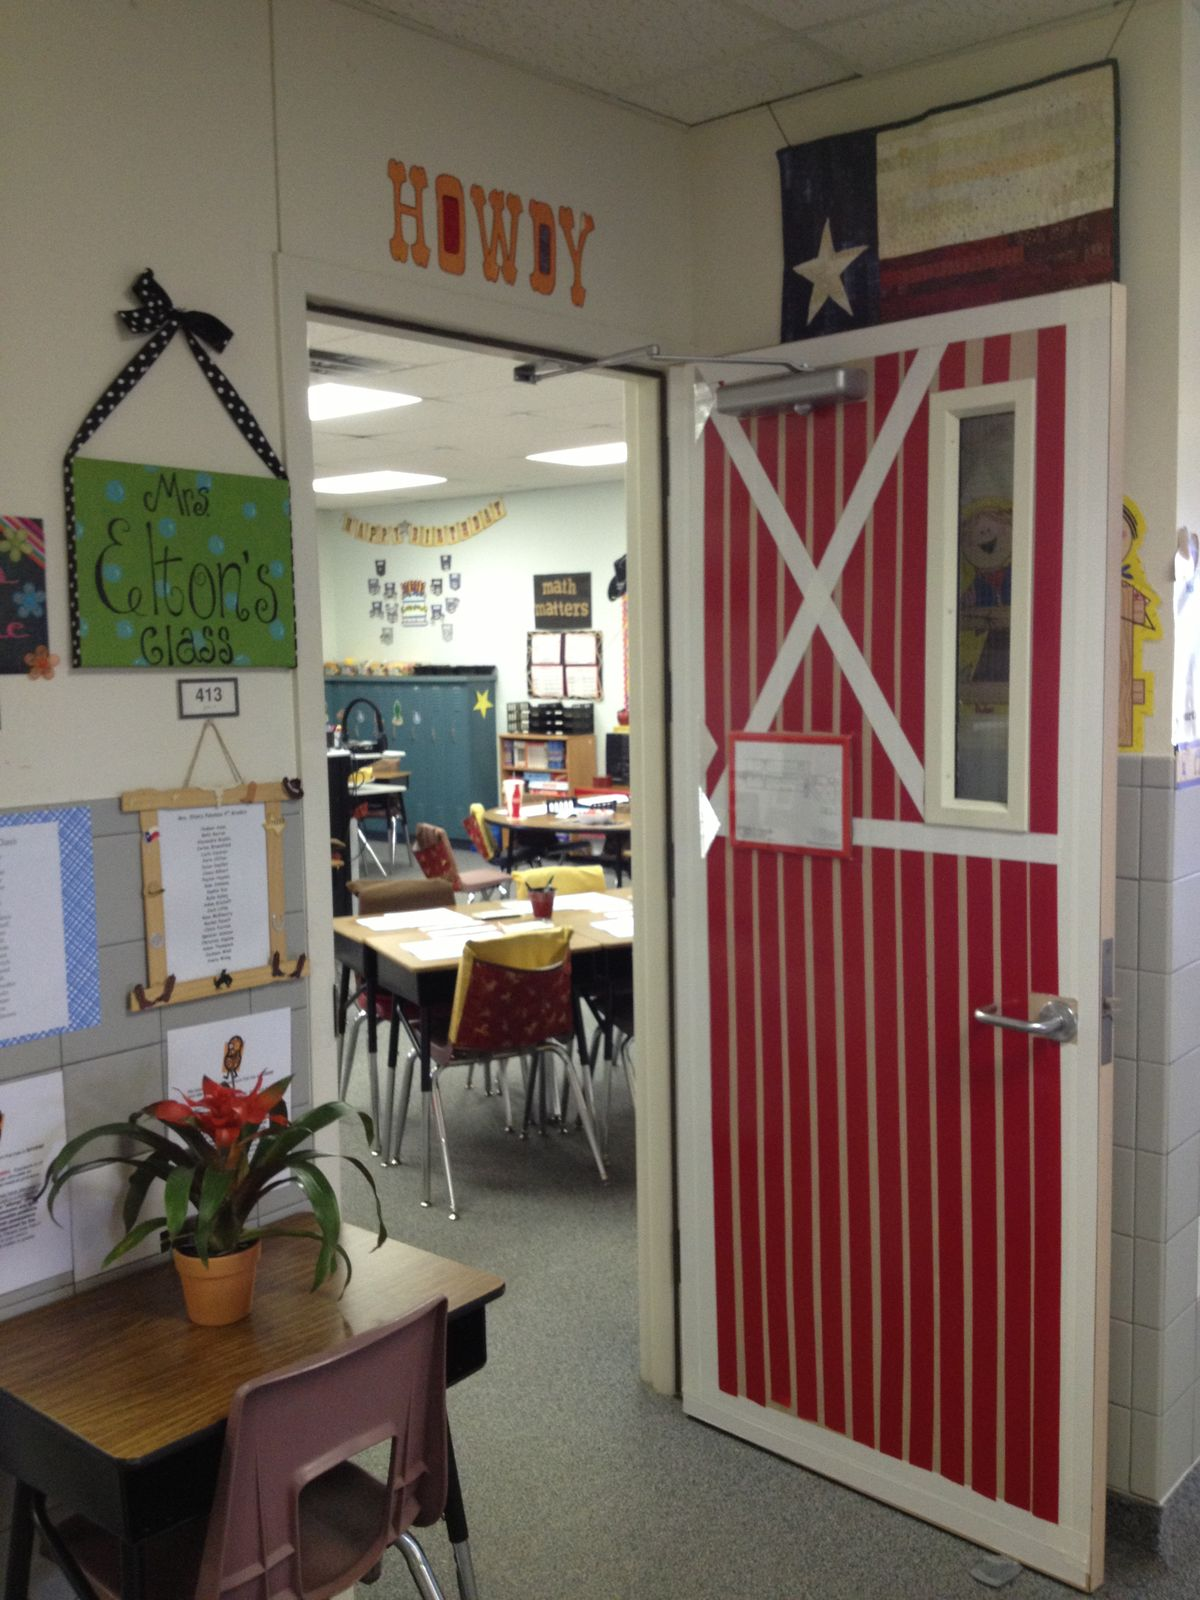 Western Classroom Decor ~ Images about western on pinterest bandana bow